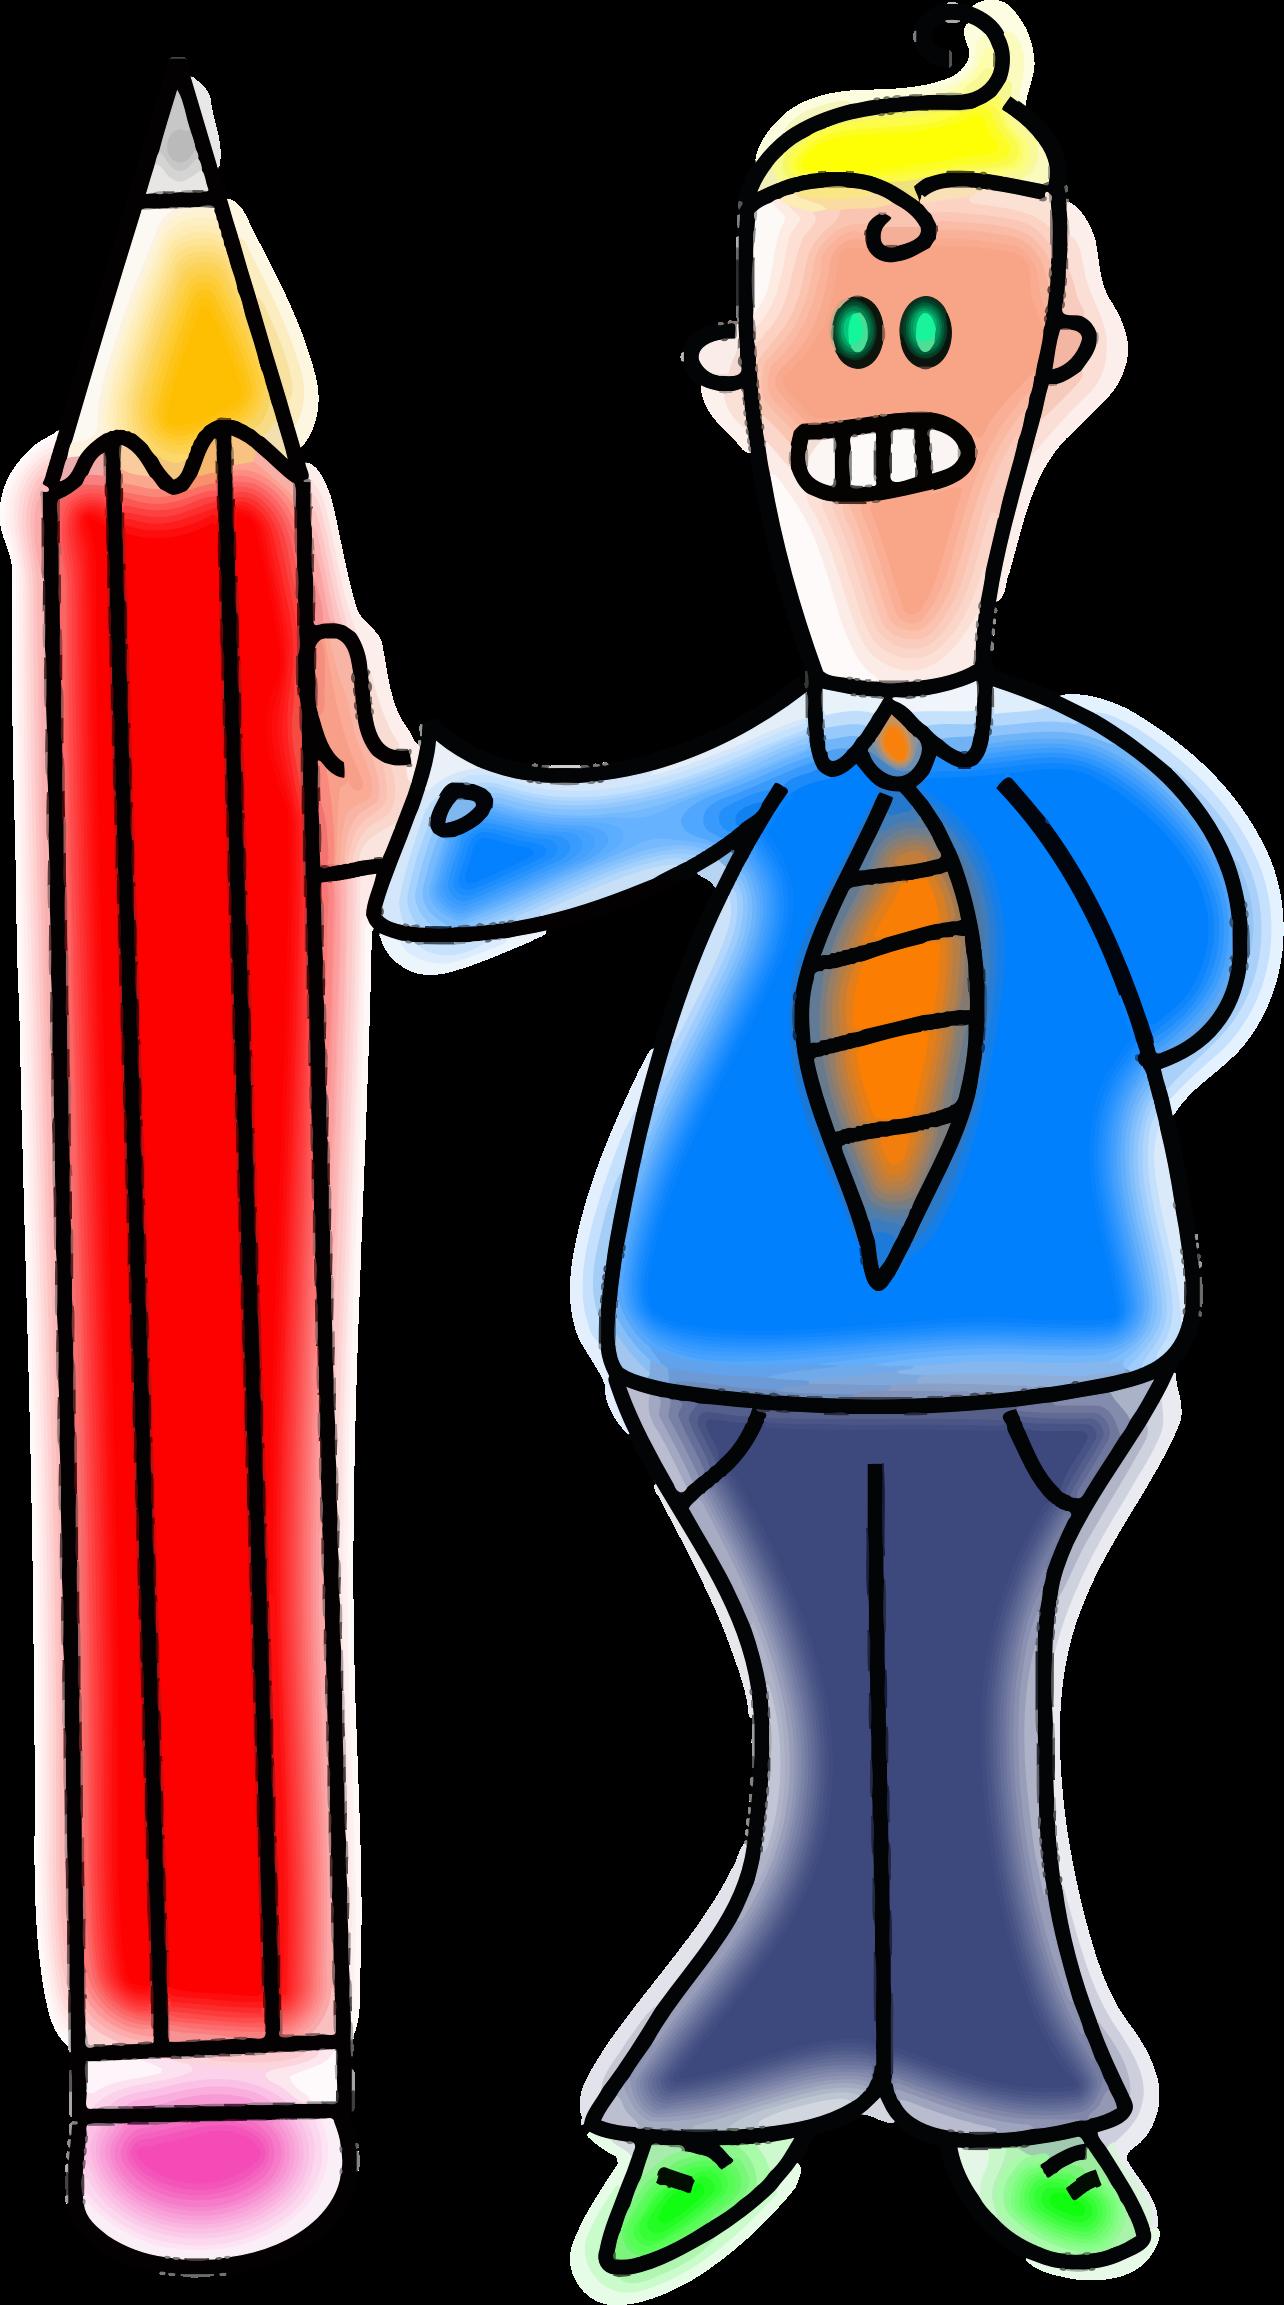 Giant man big image. Pencil clipart cartoon